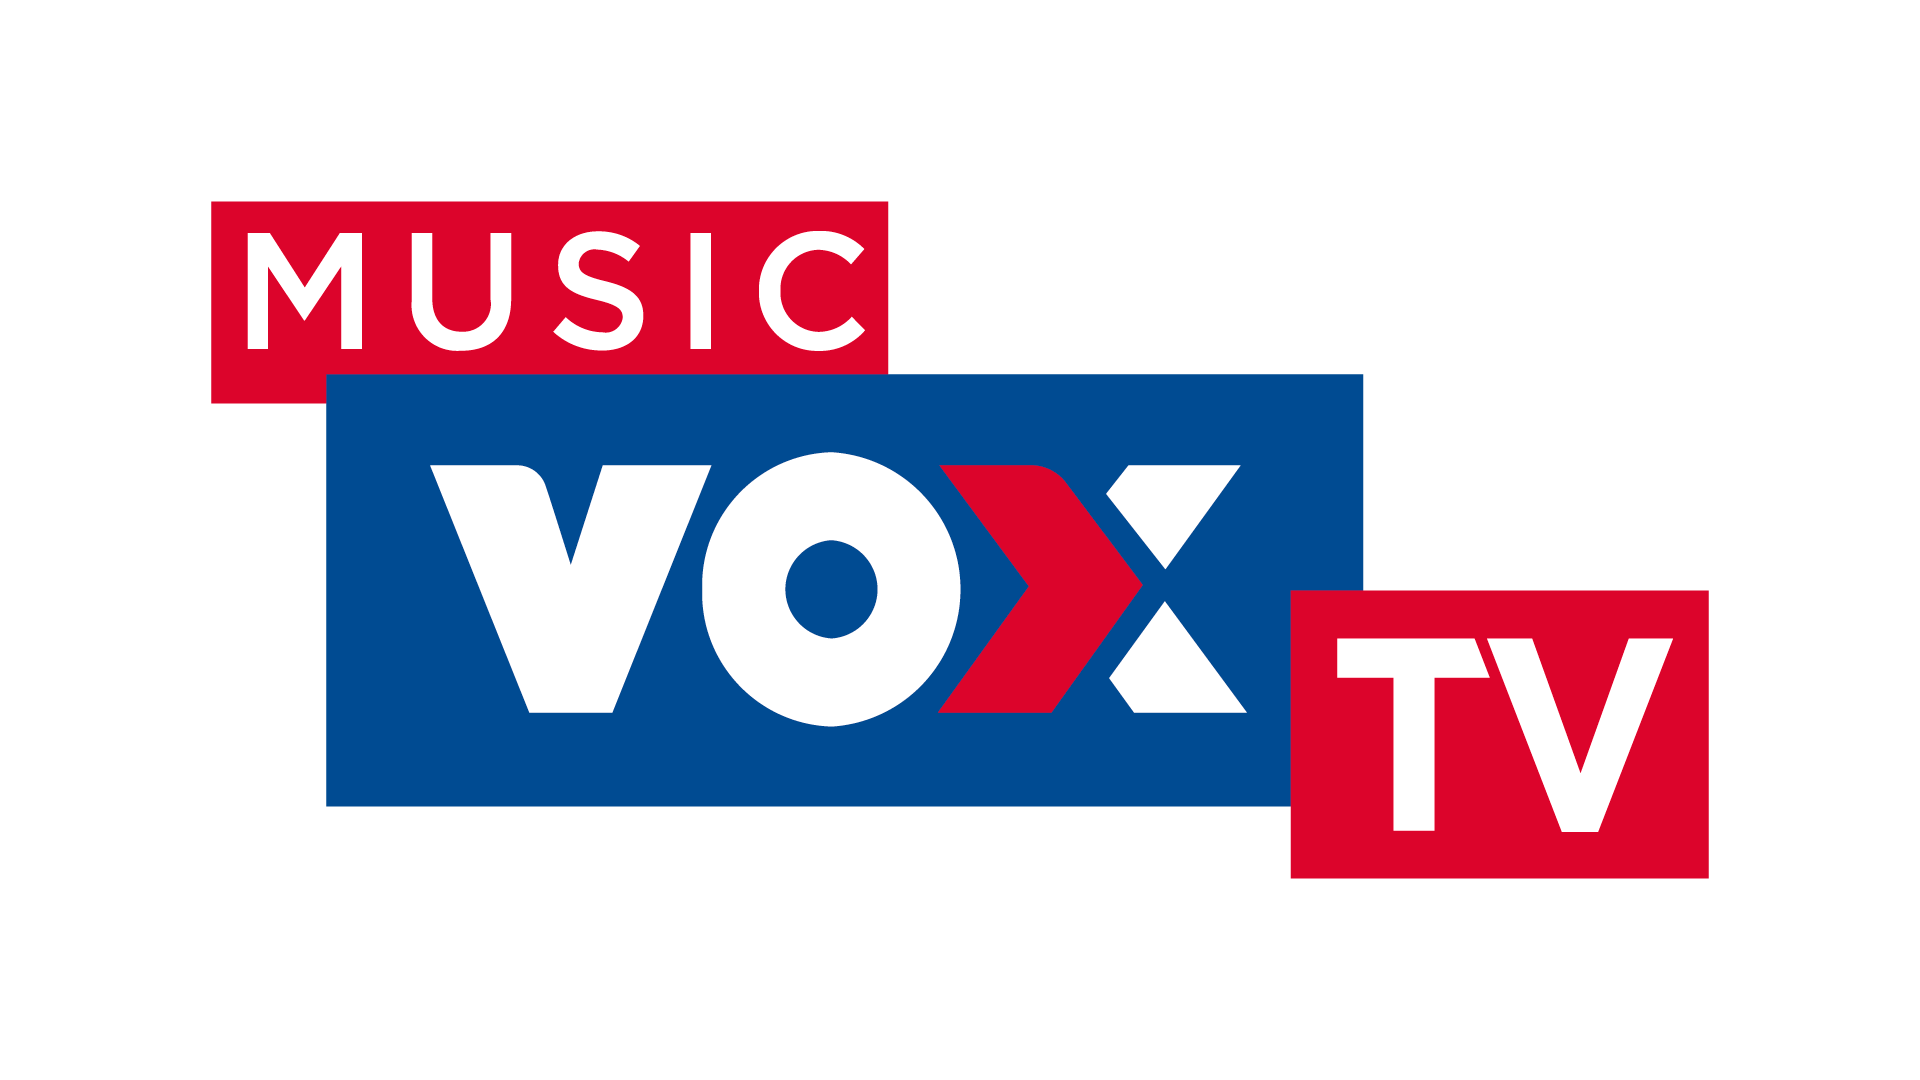 VOX Music TV Live TV, Online